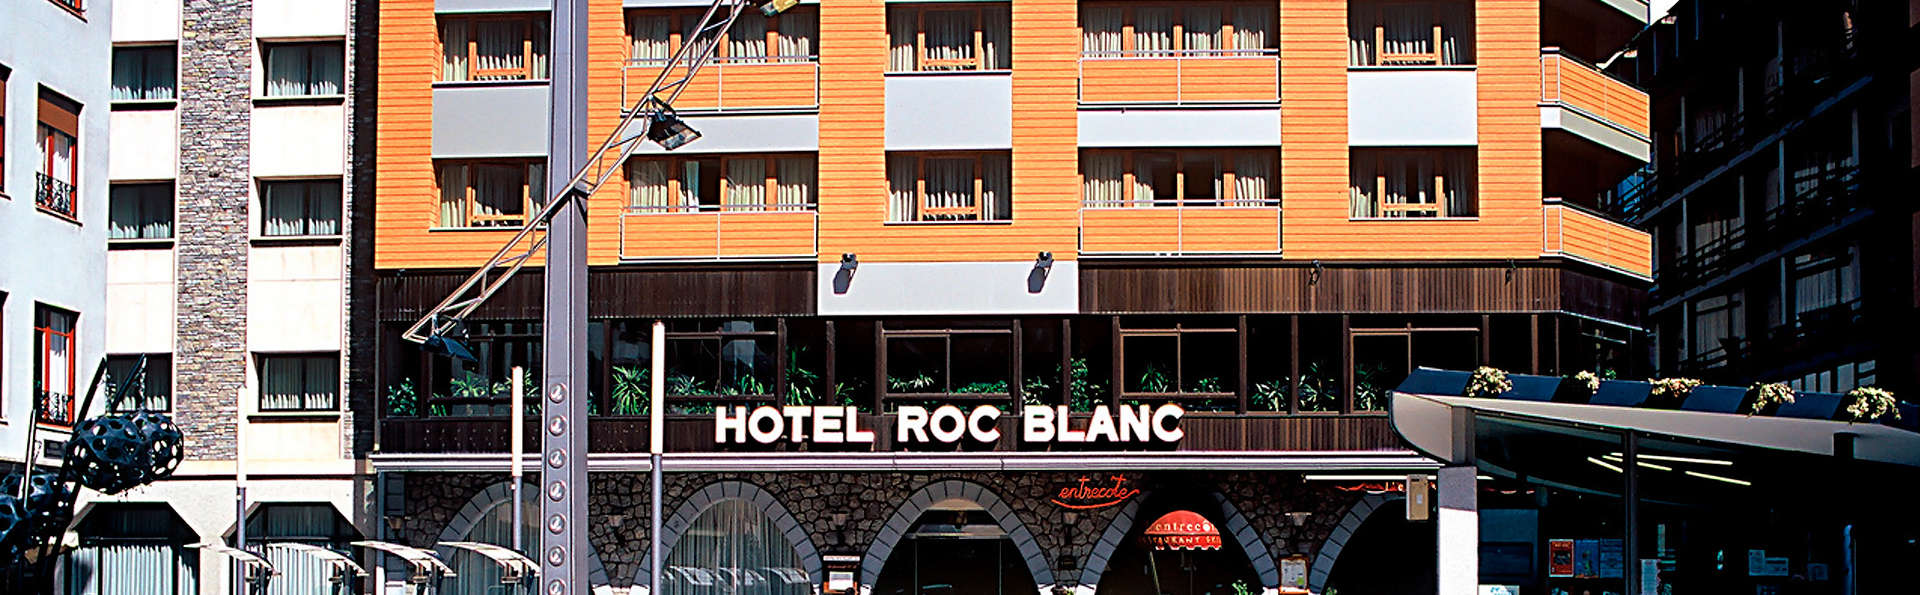 Hotel Roc Blanc & Spa - edit_front3.jpg